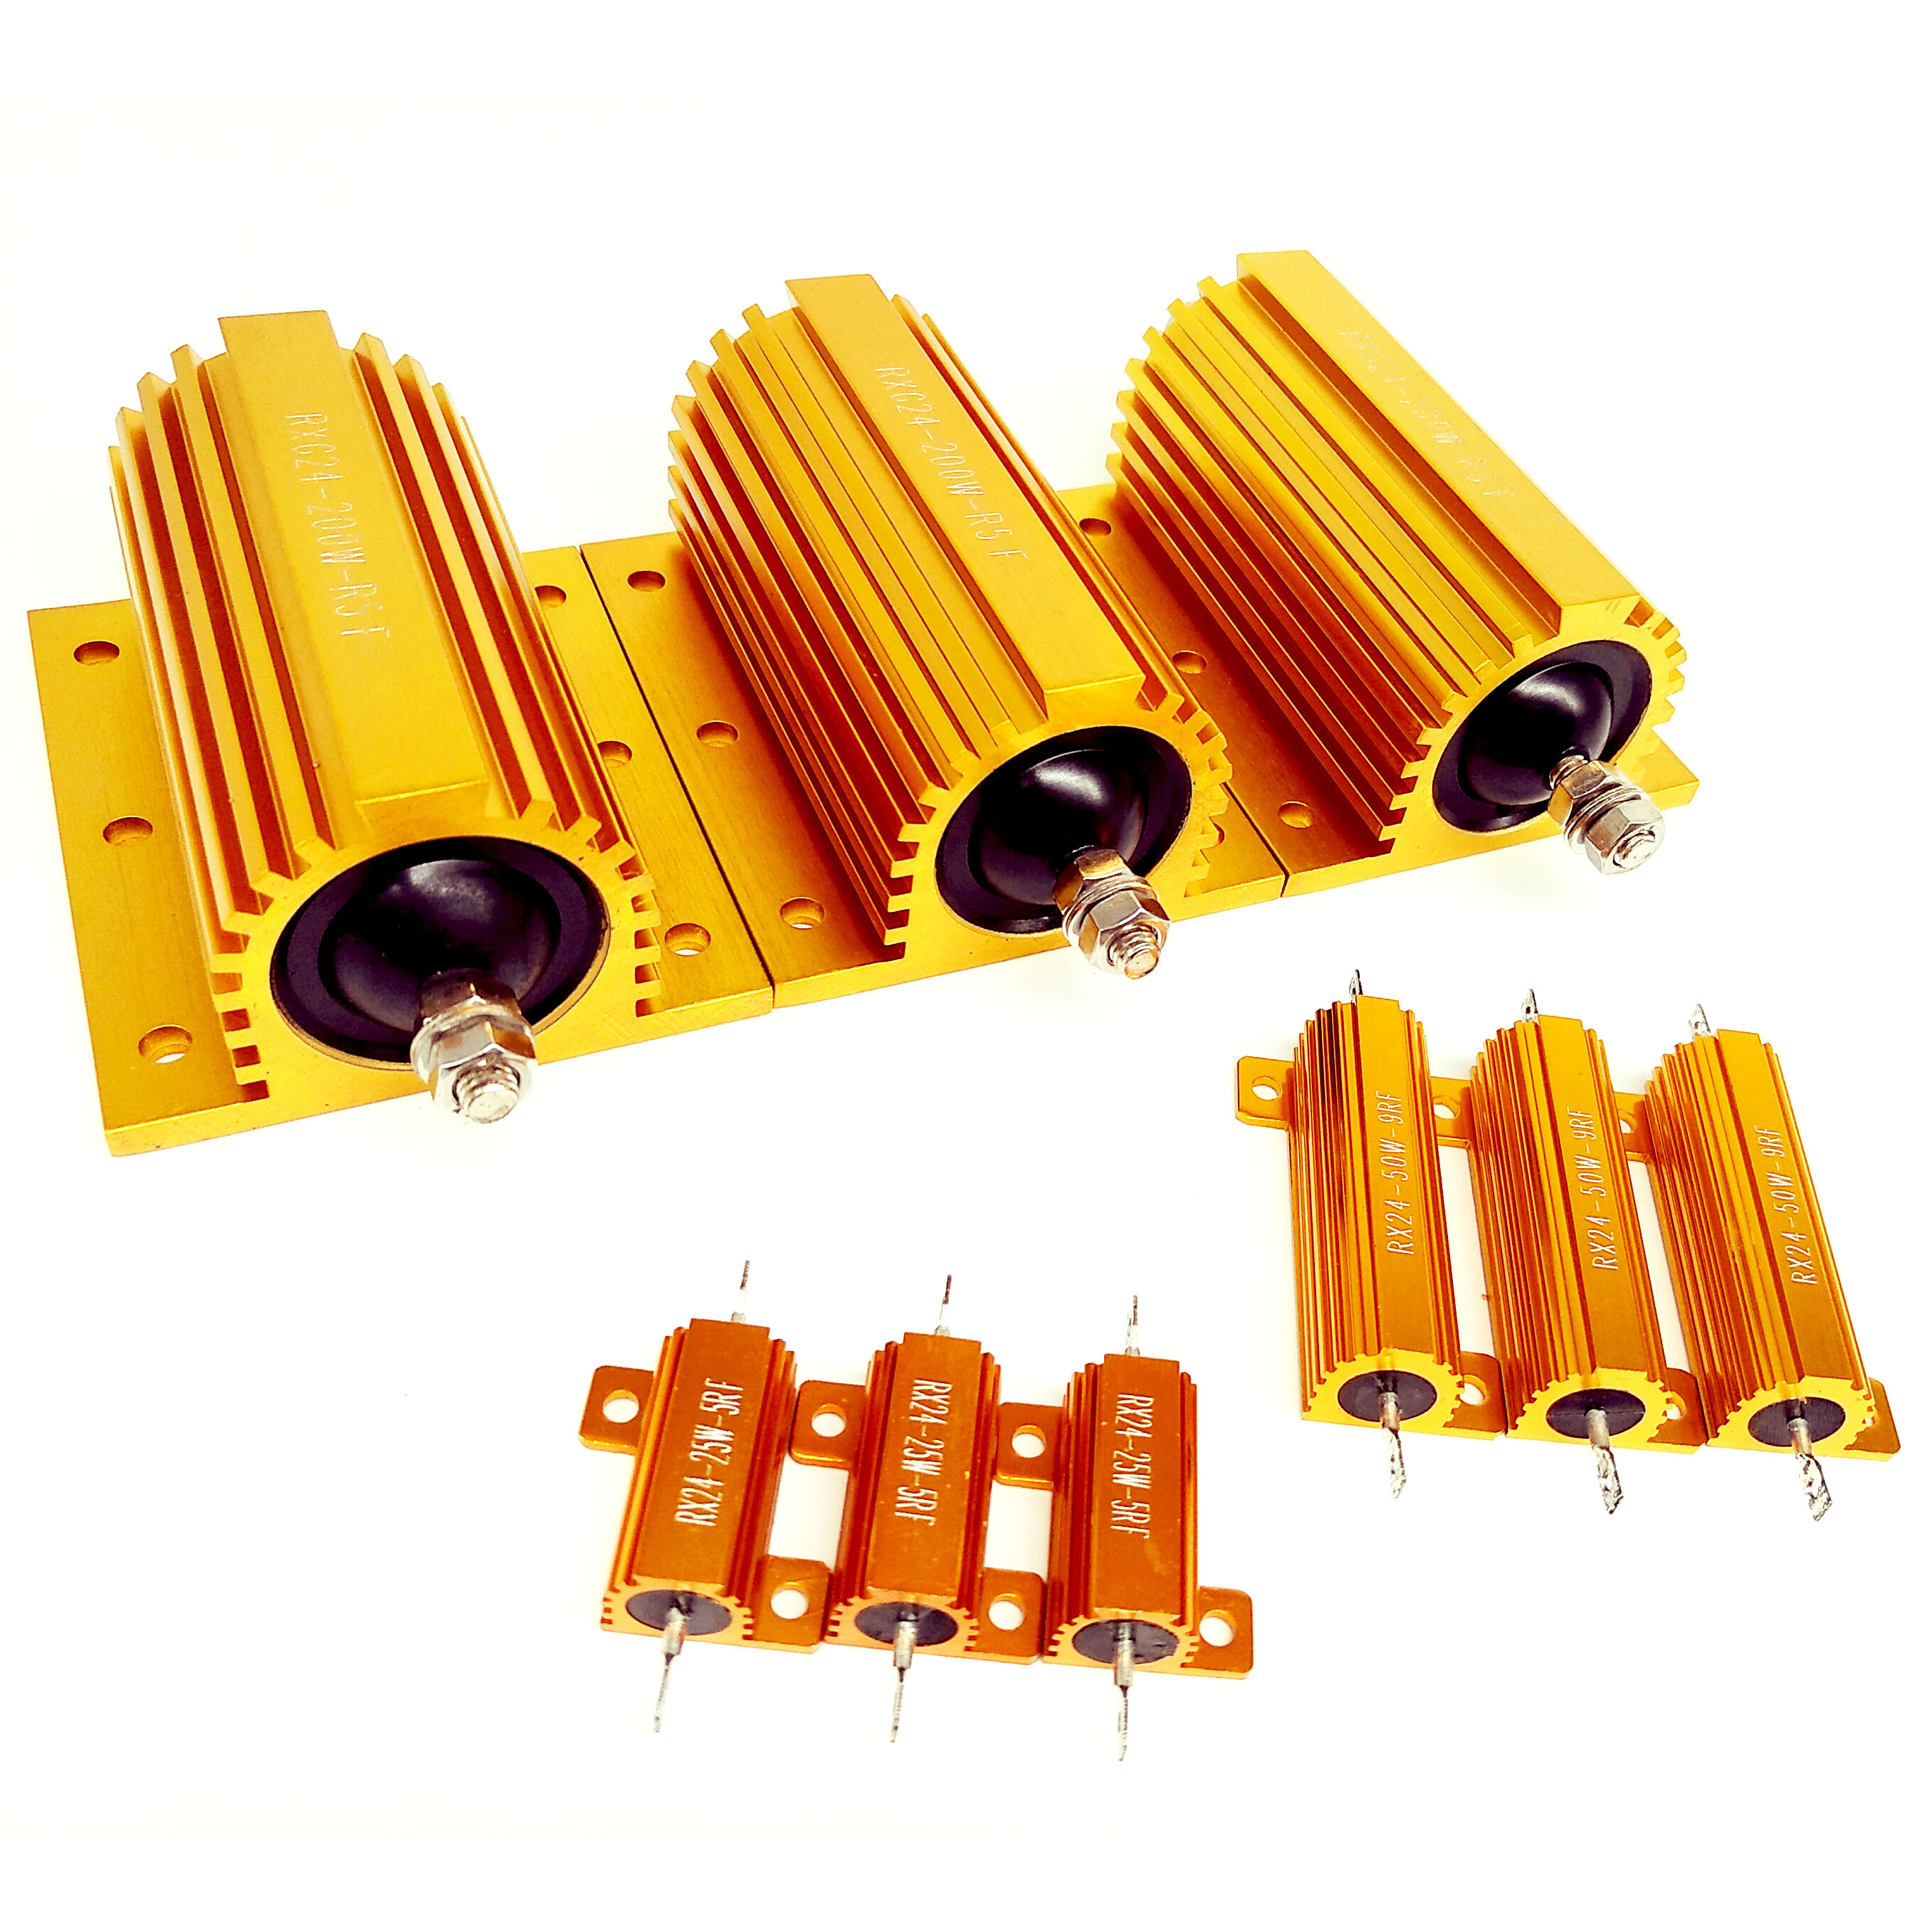 2Pcs RX24 50W Watt Wirewound Resistor 1R 2R 3R 4R 5R 6R 8R 10R 15R 20R 30R 40R 50R 100R 1K Ohm LED Load Resistor Aluminum Case